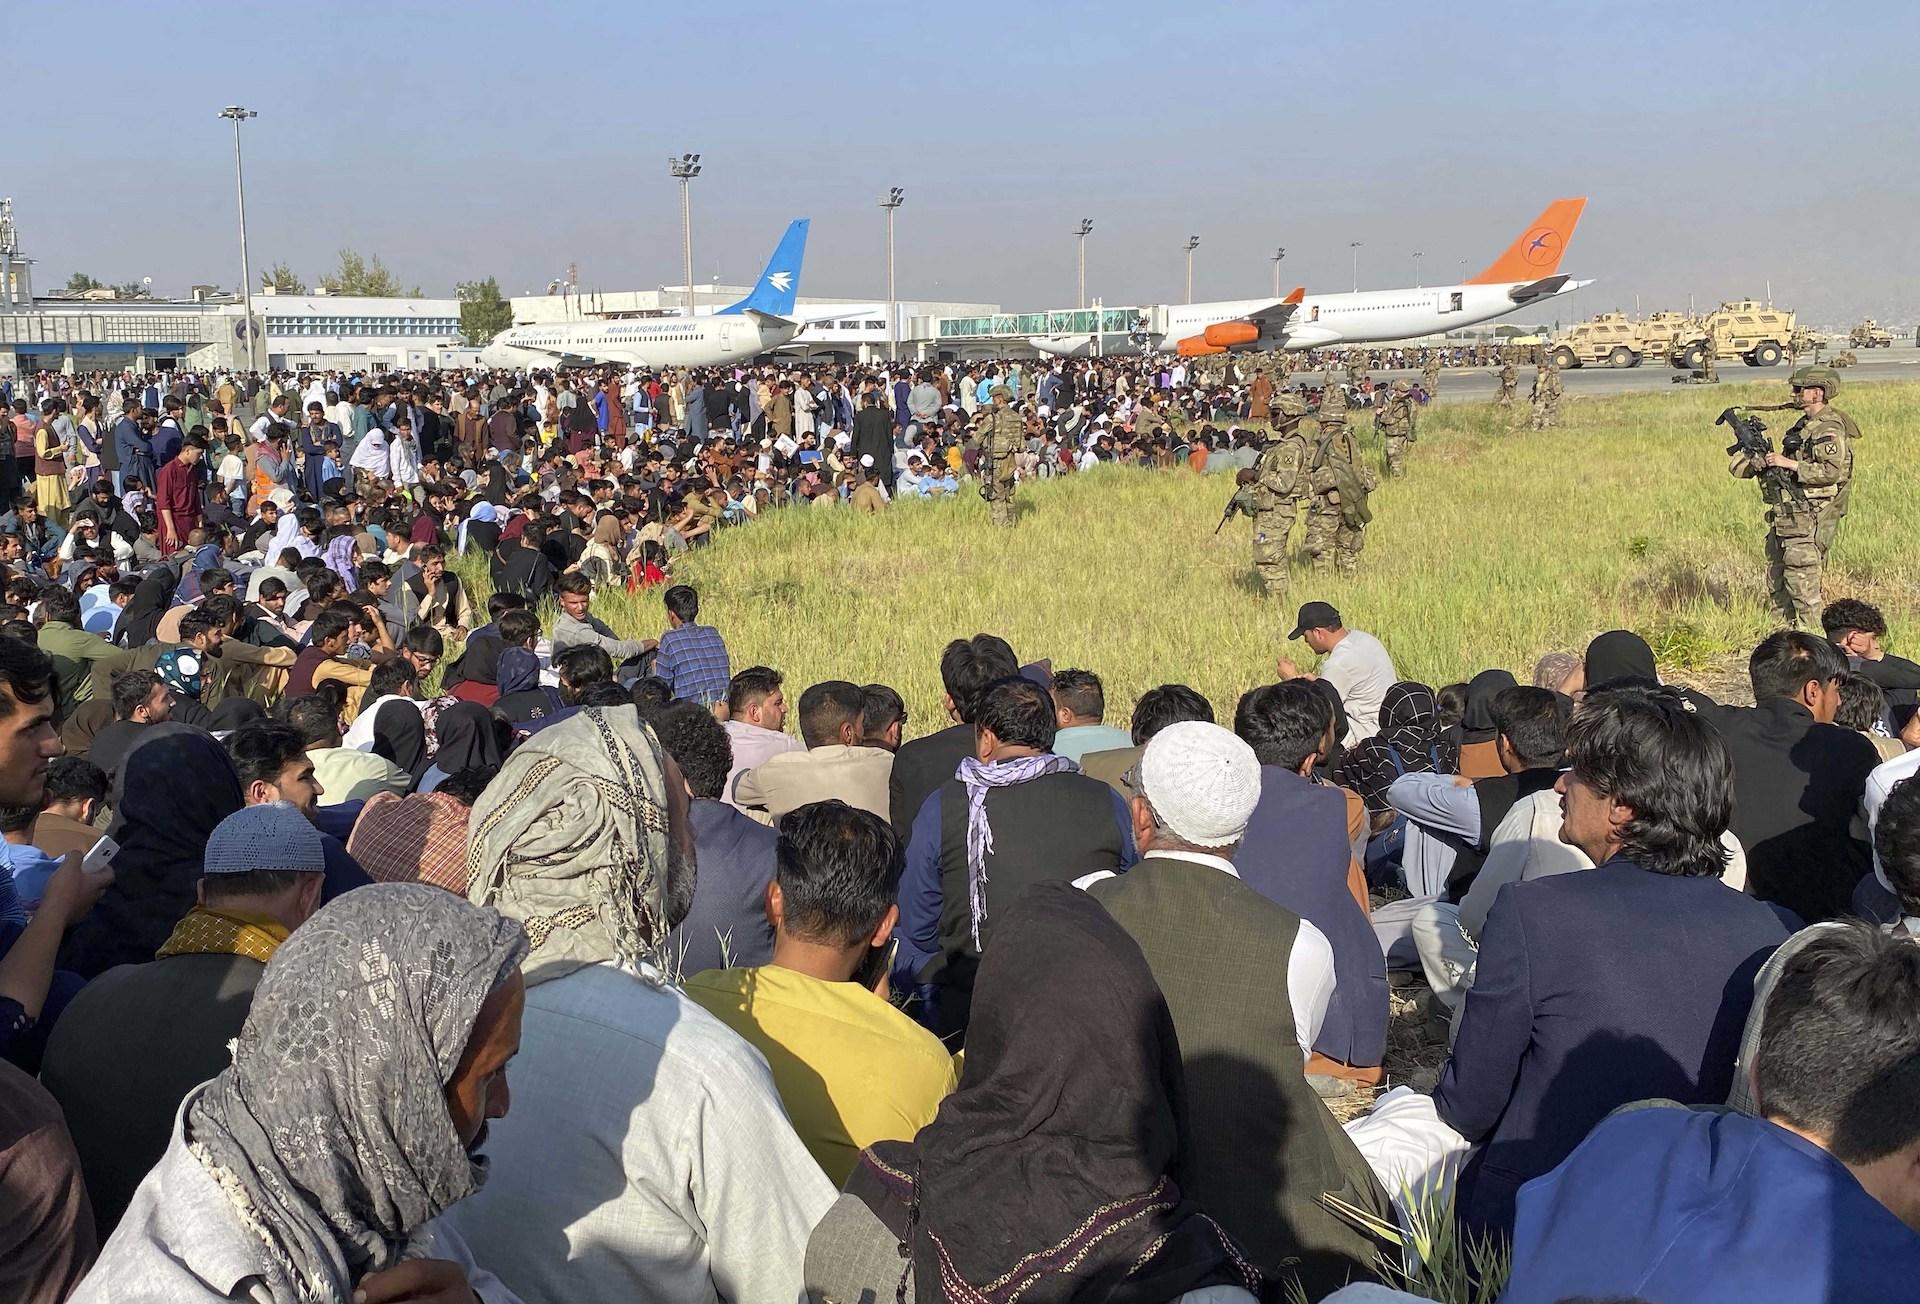 Afghan staff in peril, aid agencies wrestle security versus mission